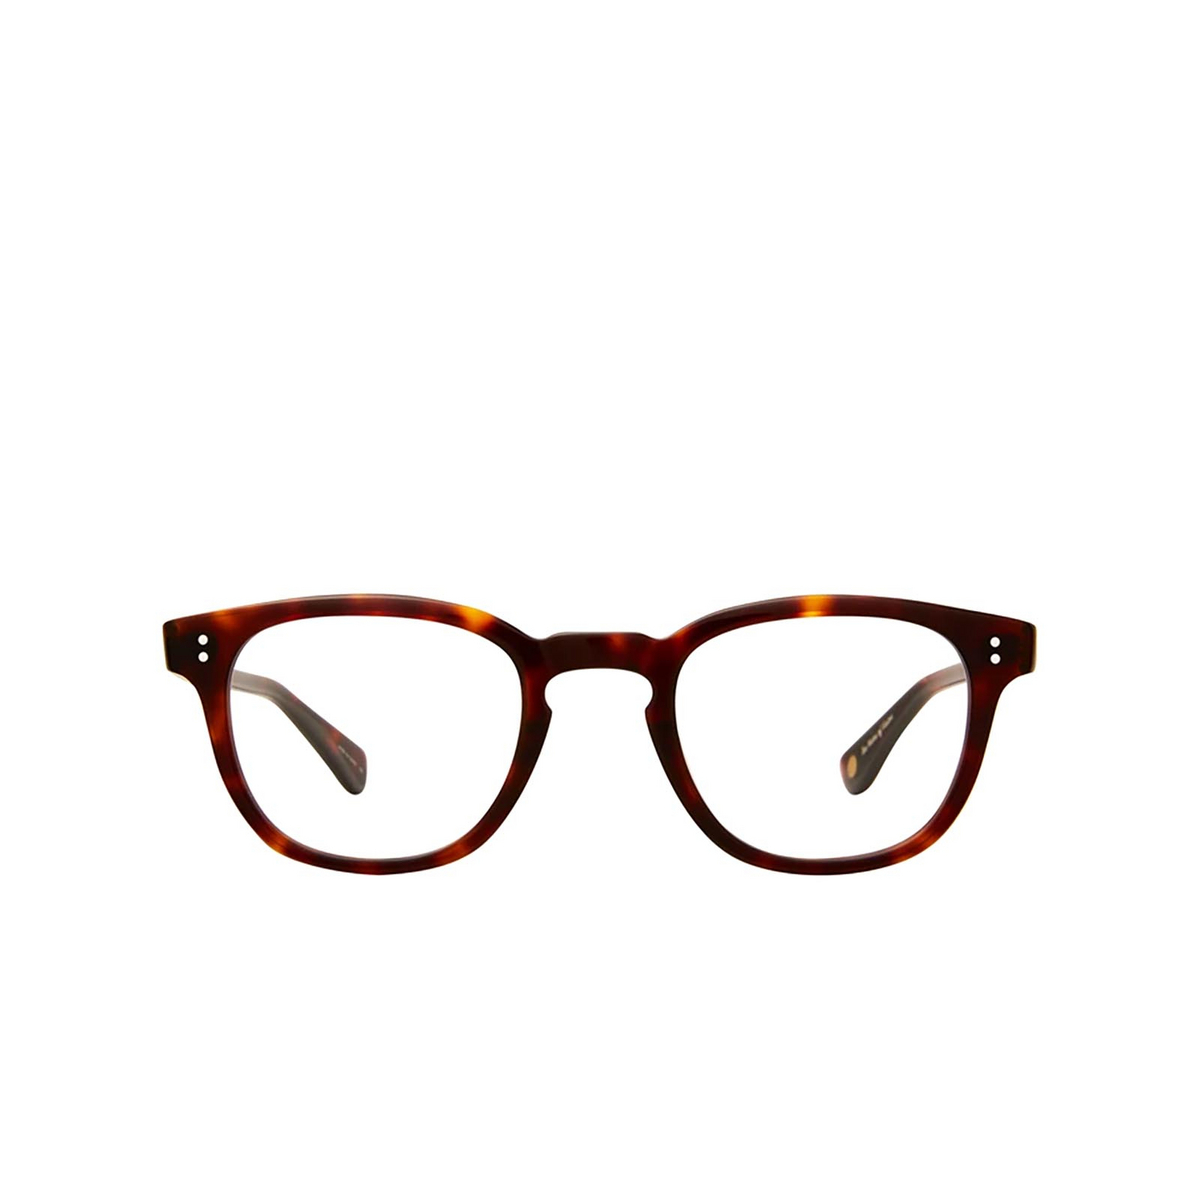 Garrett Leight® Square Eyeglasses: Douglas color 1965 Tortoise 1965TO - front view.